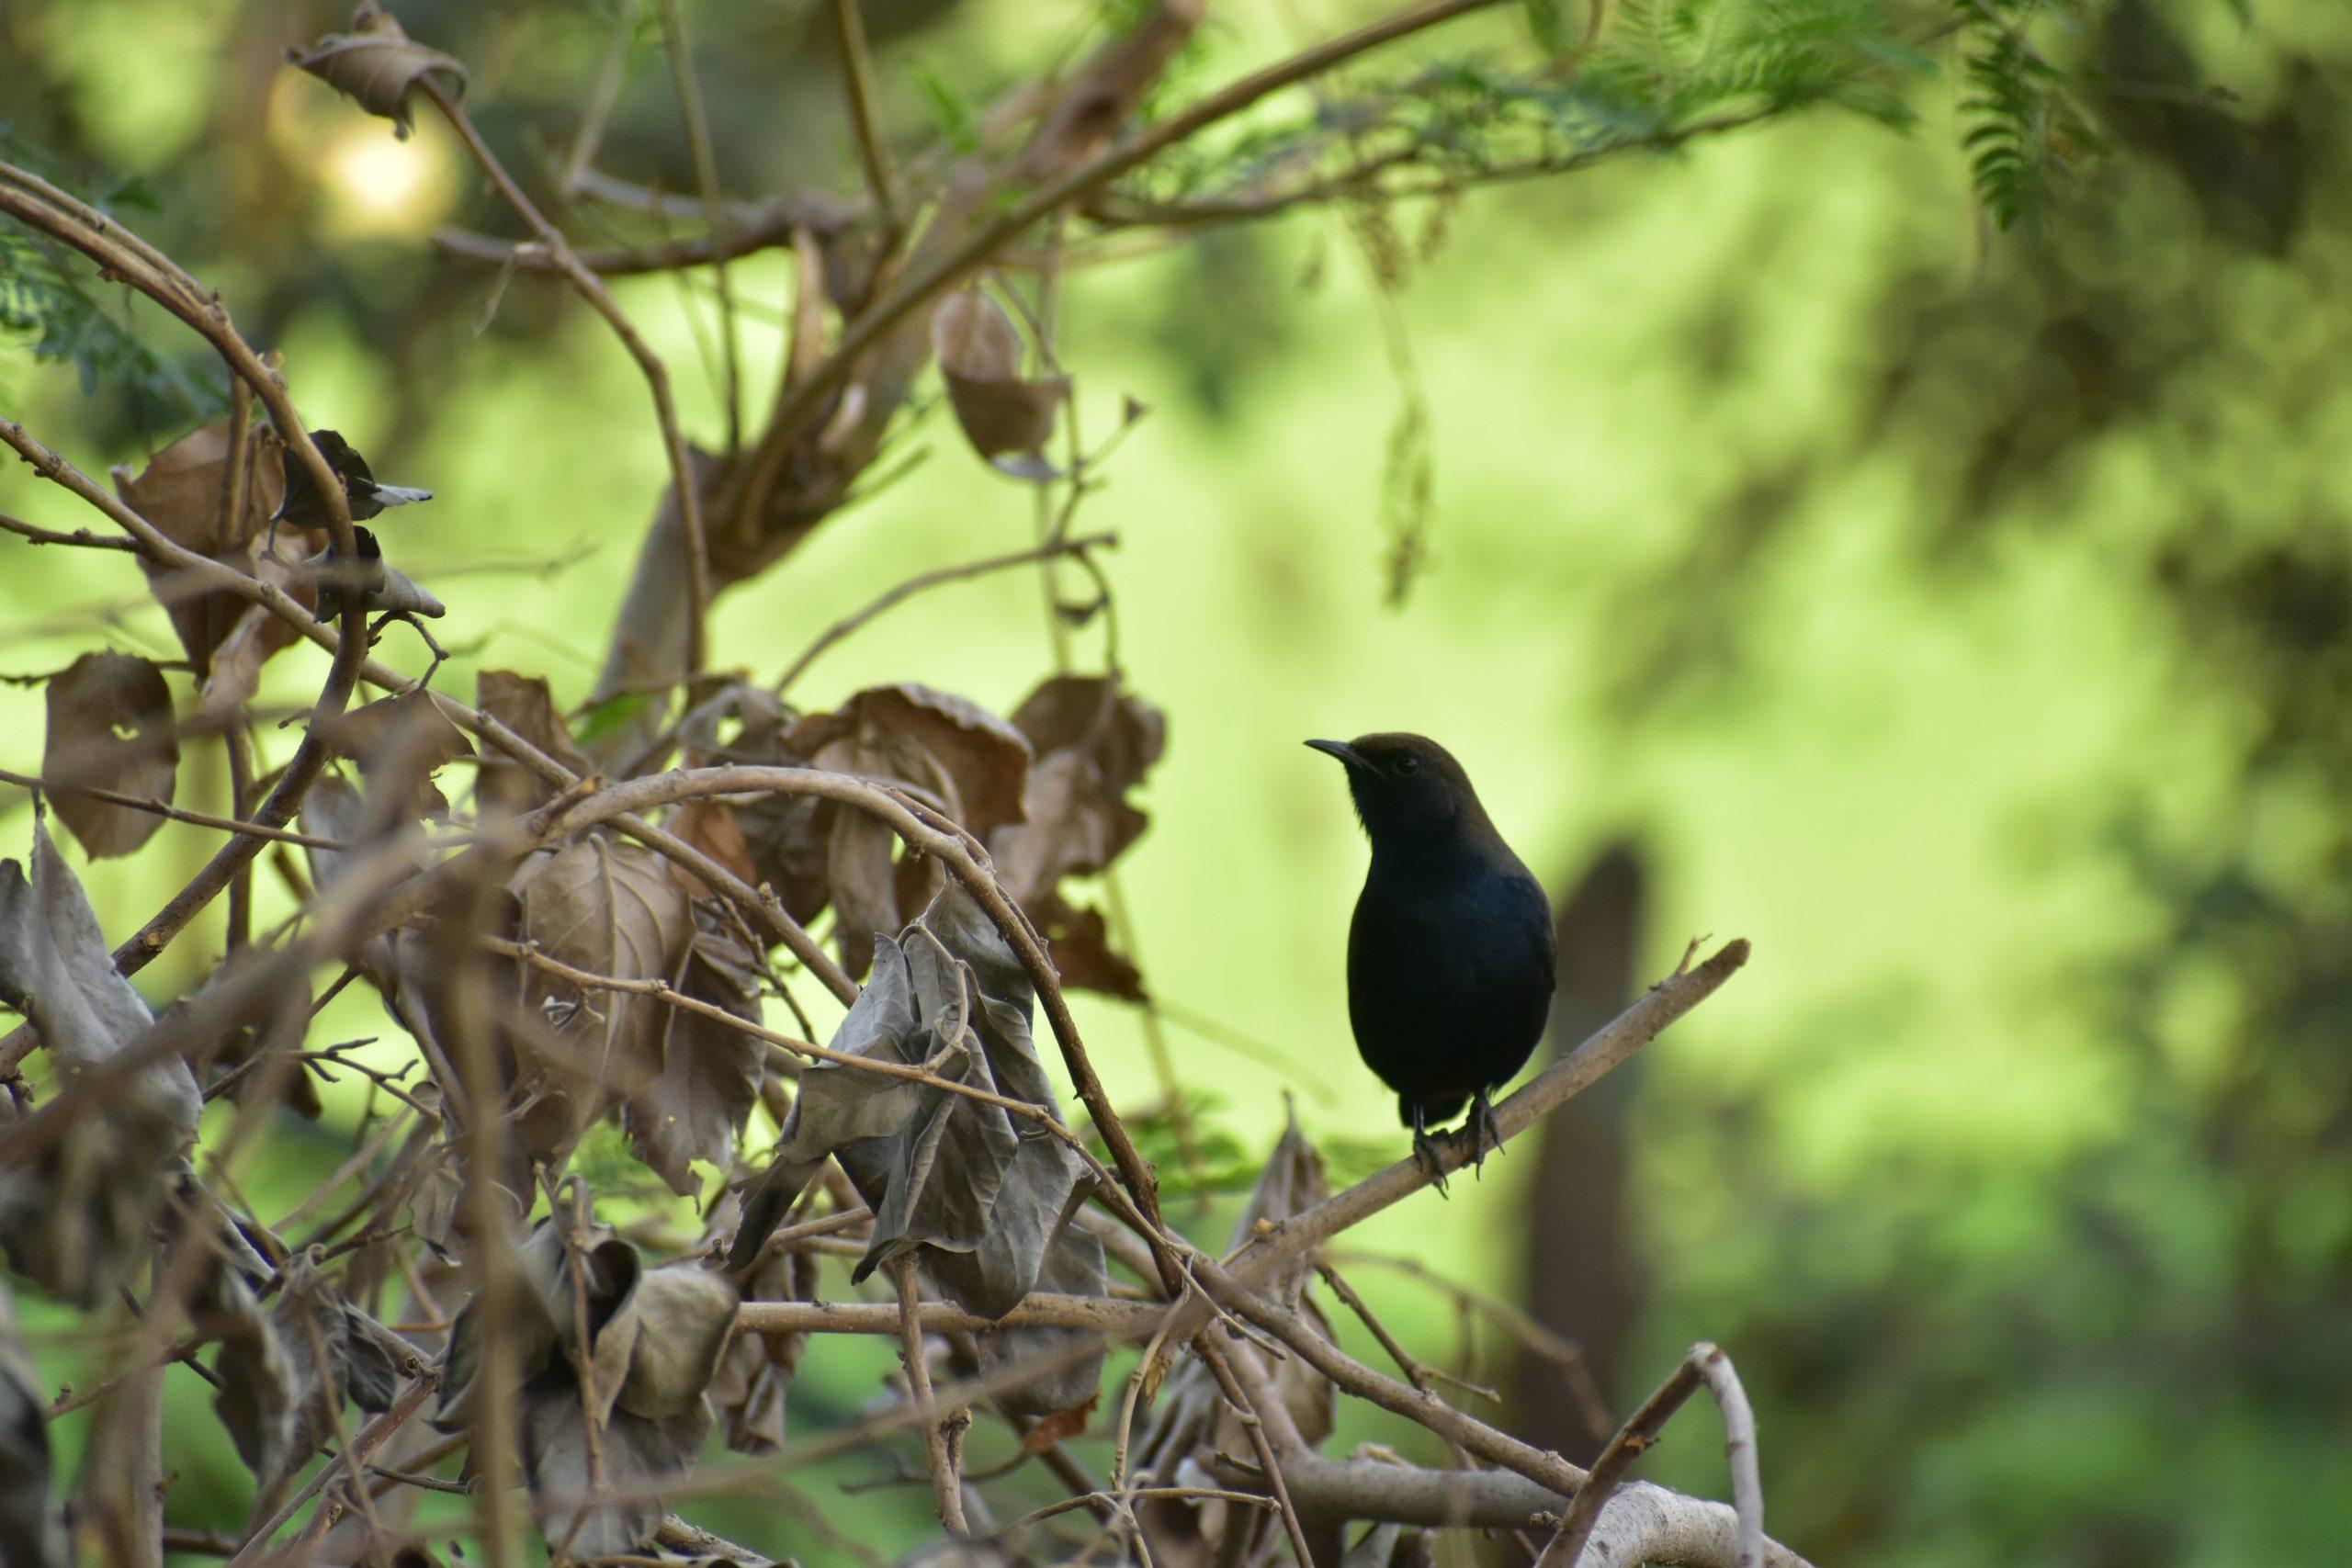 A black catbird